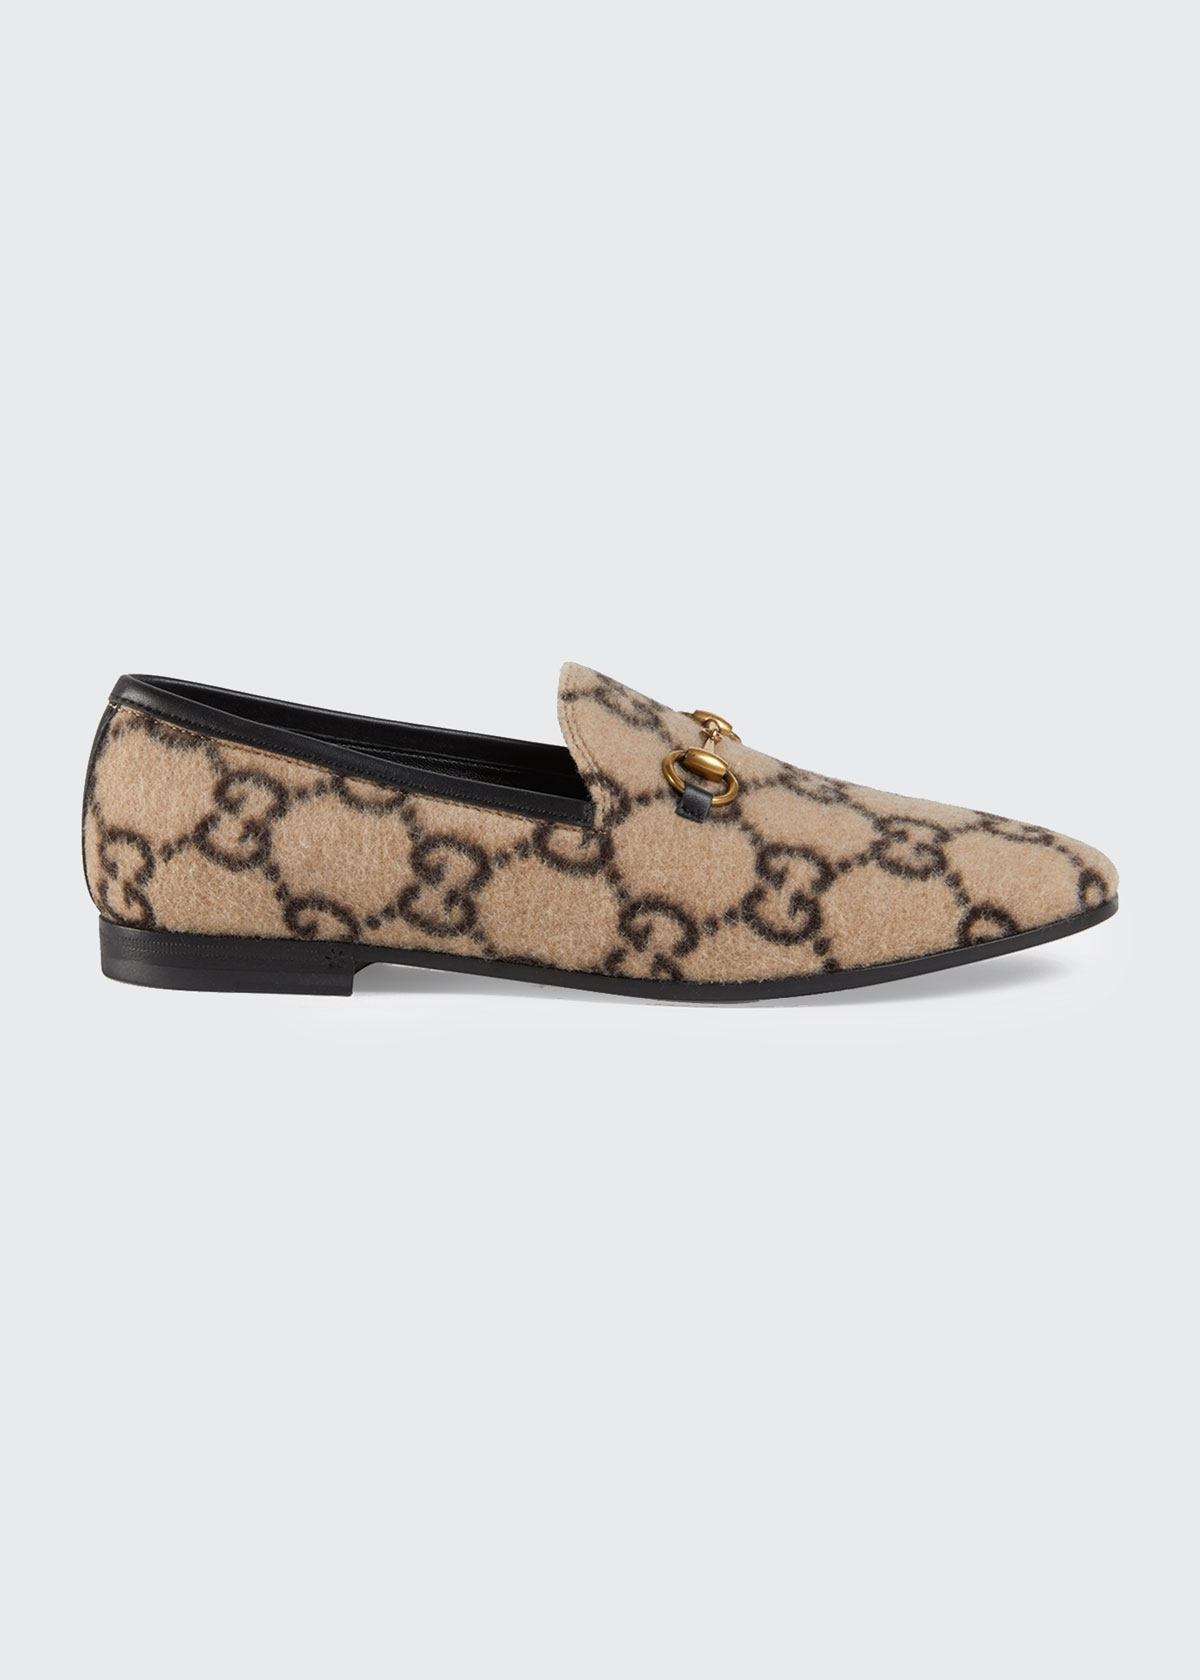 Gucci Flats JORDAAN FLAT GG FLANNEL LOAFERS